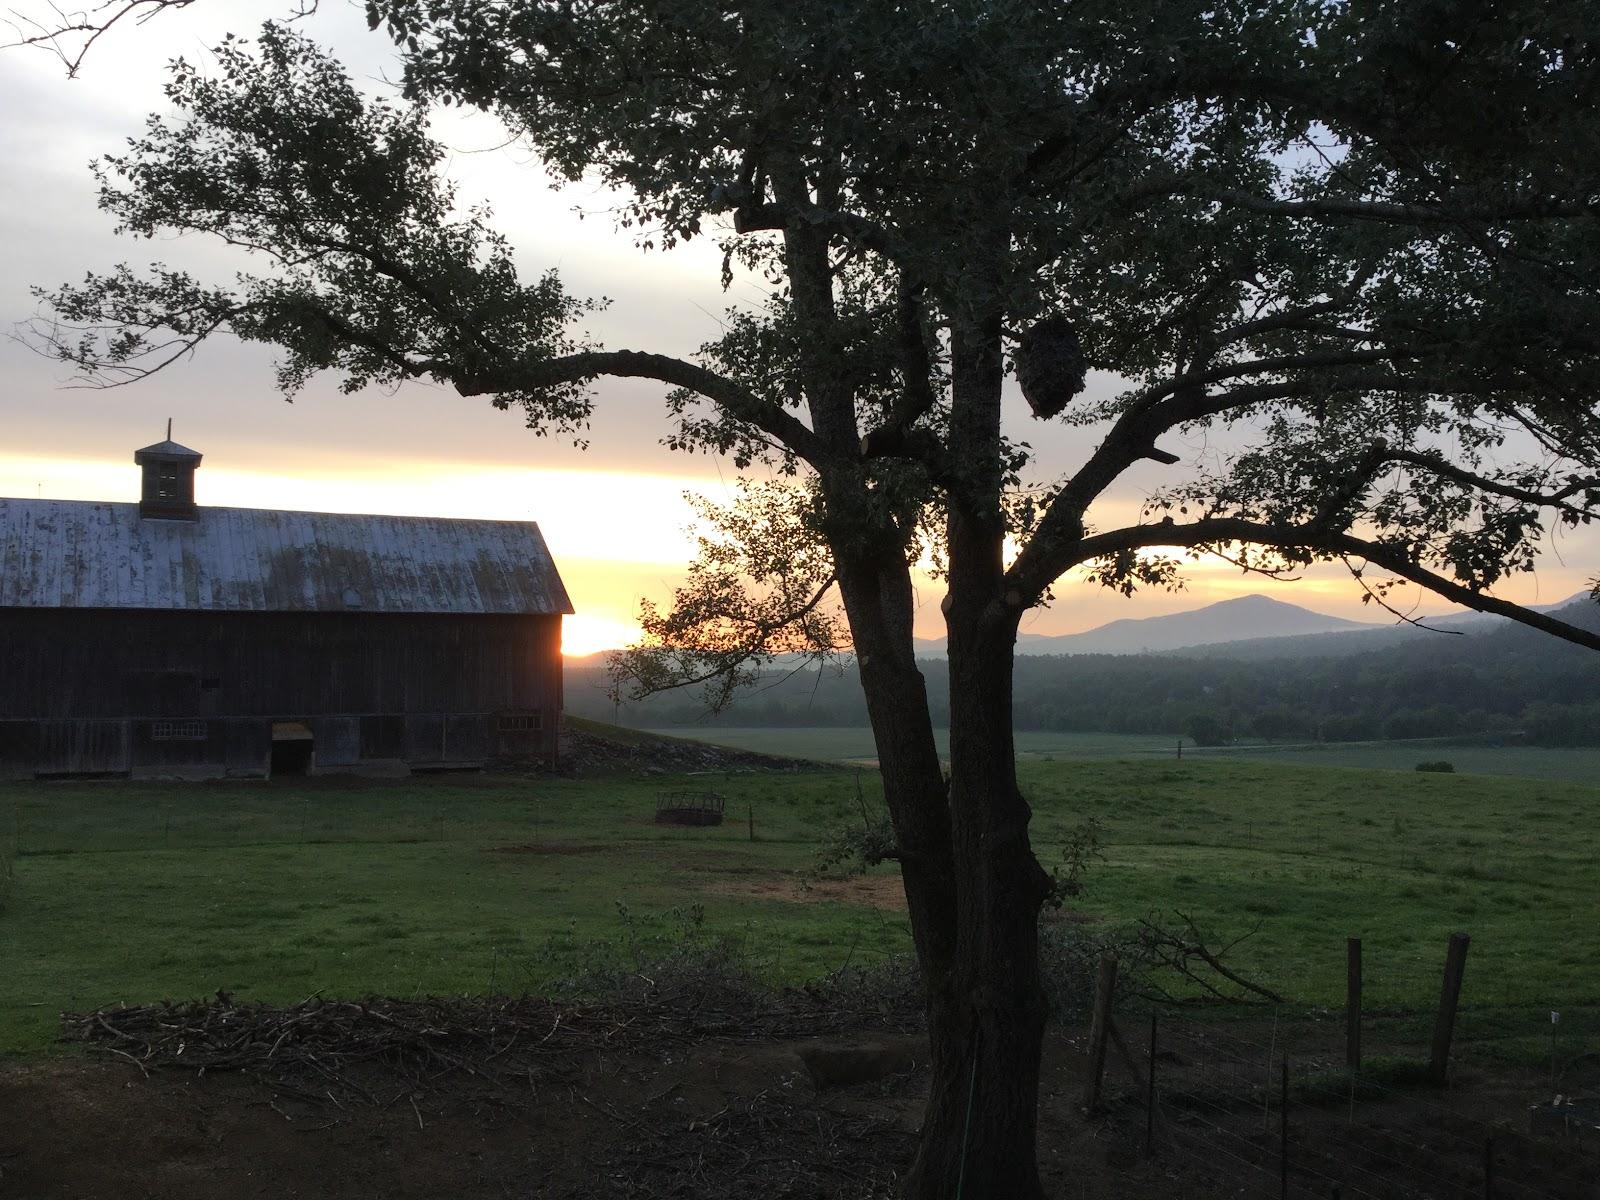 Farm Image 1